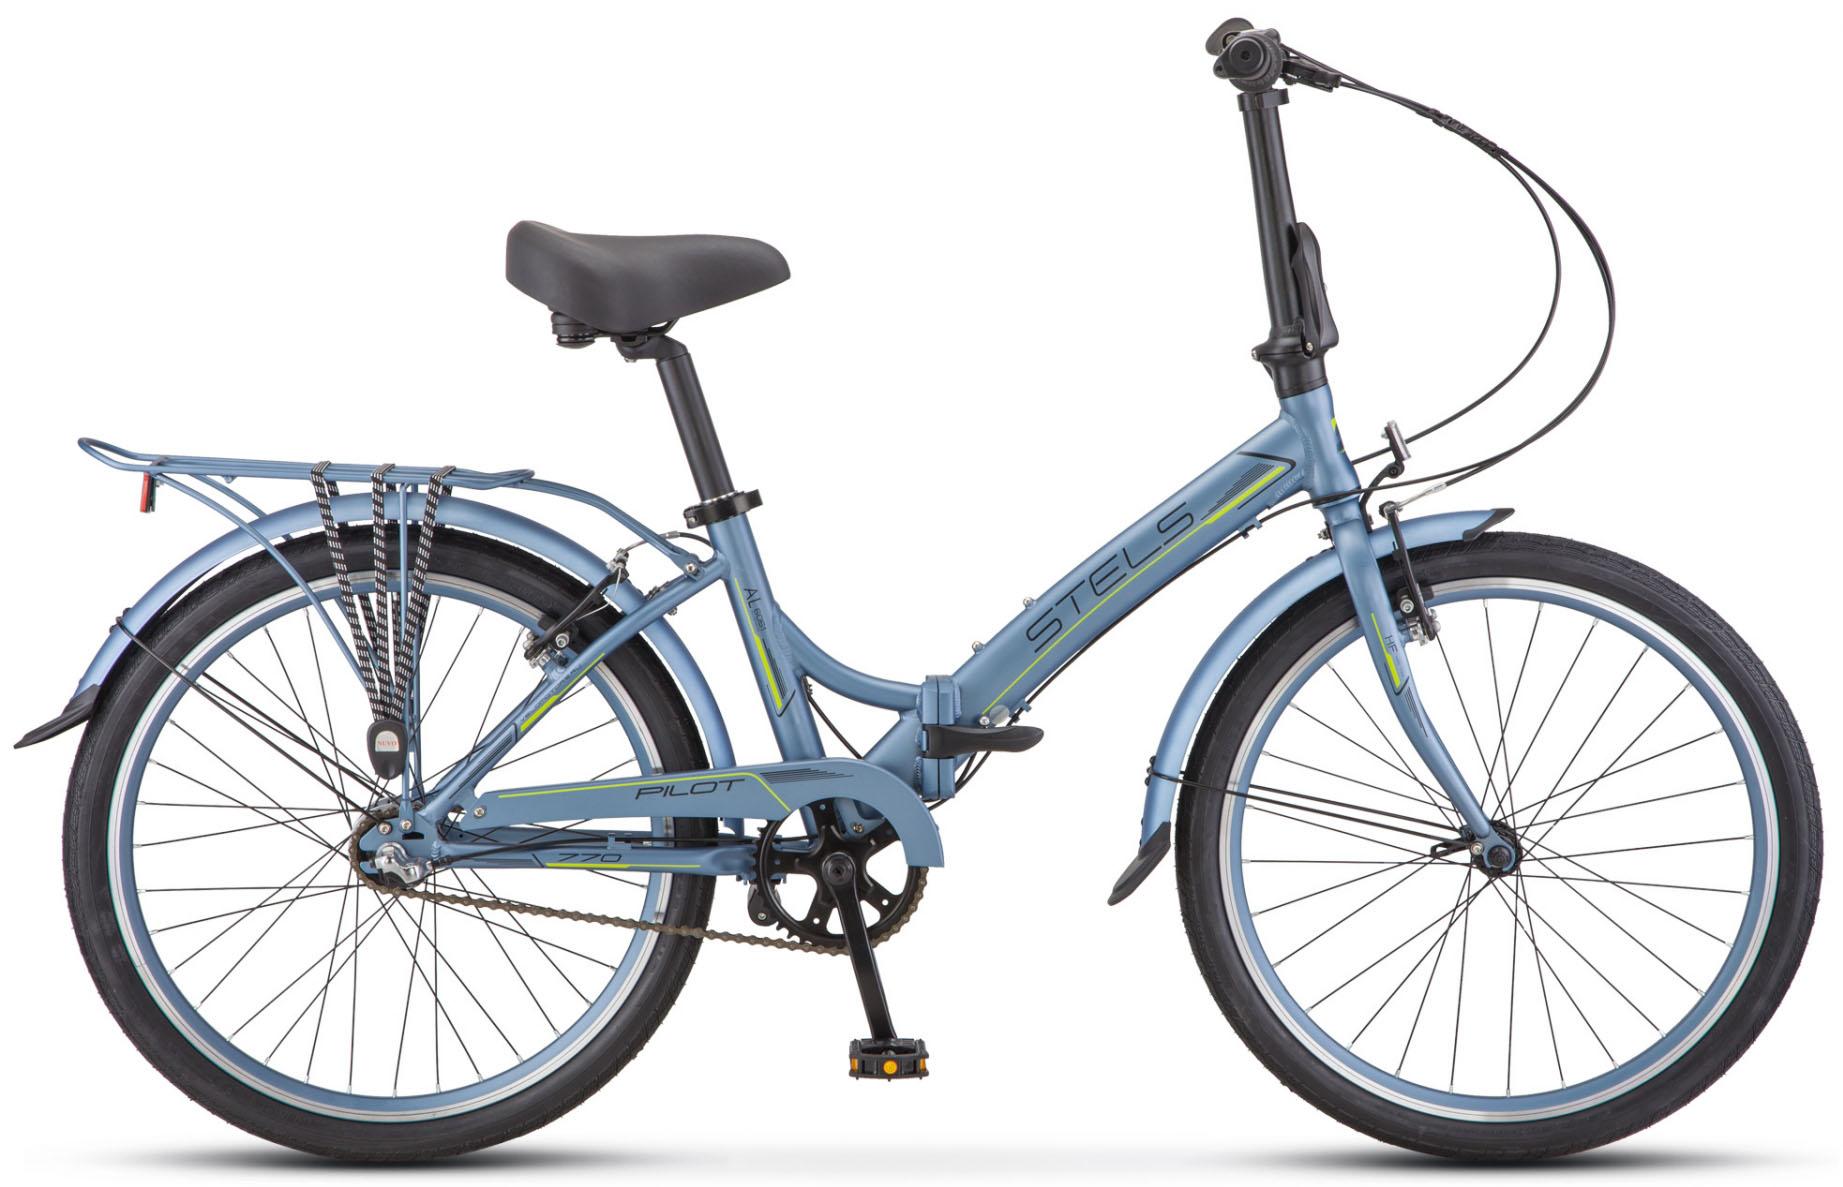 Велосипед Stels Pilot 770 24 V010 2019 велосипед stels pilot 170 16 2016